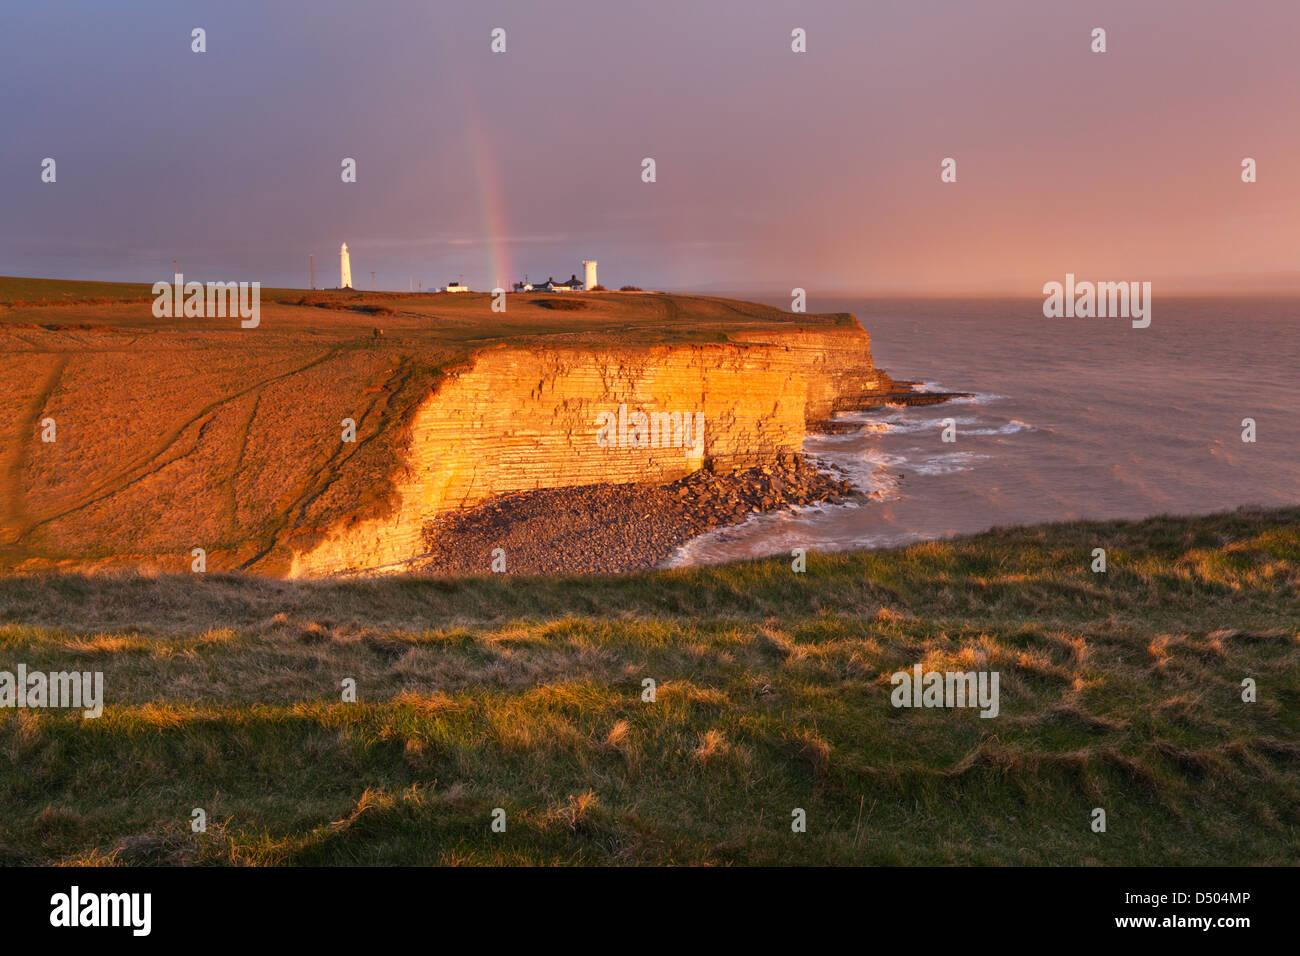 Rainbow over Nash Point at Sunset. Glamorgan Heritage Coast. Vale of Glamorgan. Wales. UK. - Stock Image